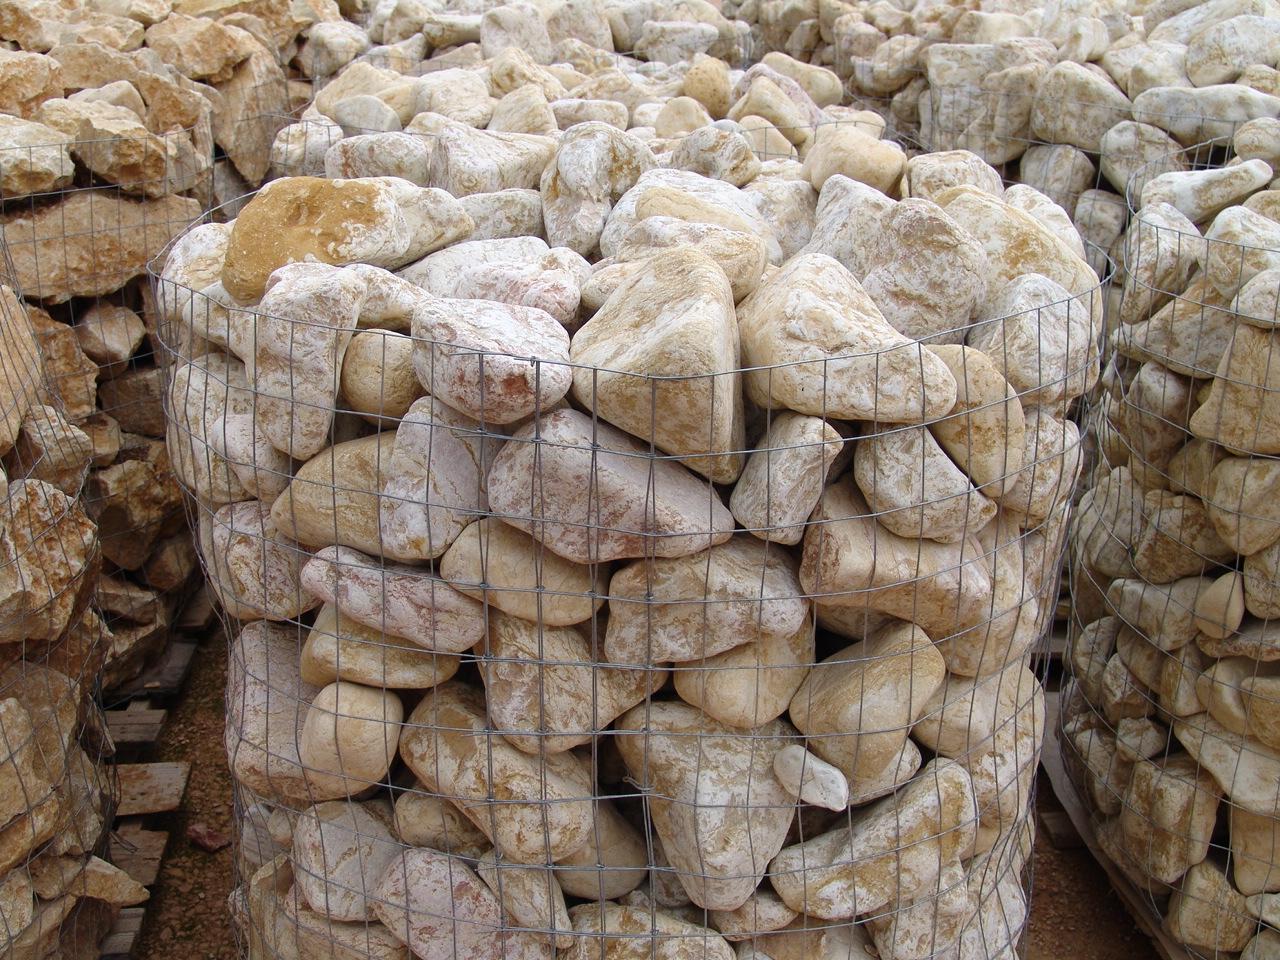 Vendita Pietre Da Giardino : Foto di pietre per muri sassi per muratura inerti per muri.